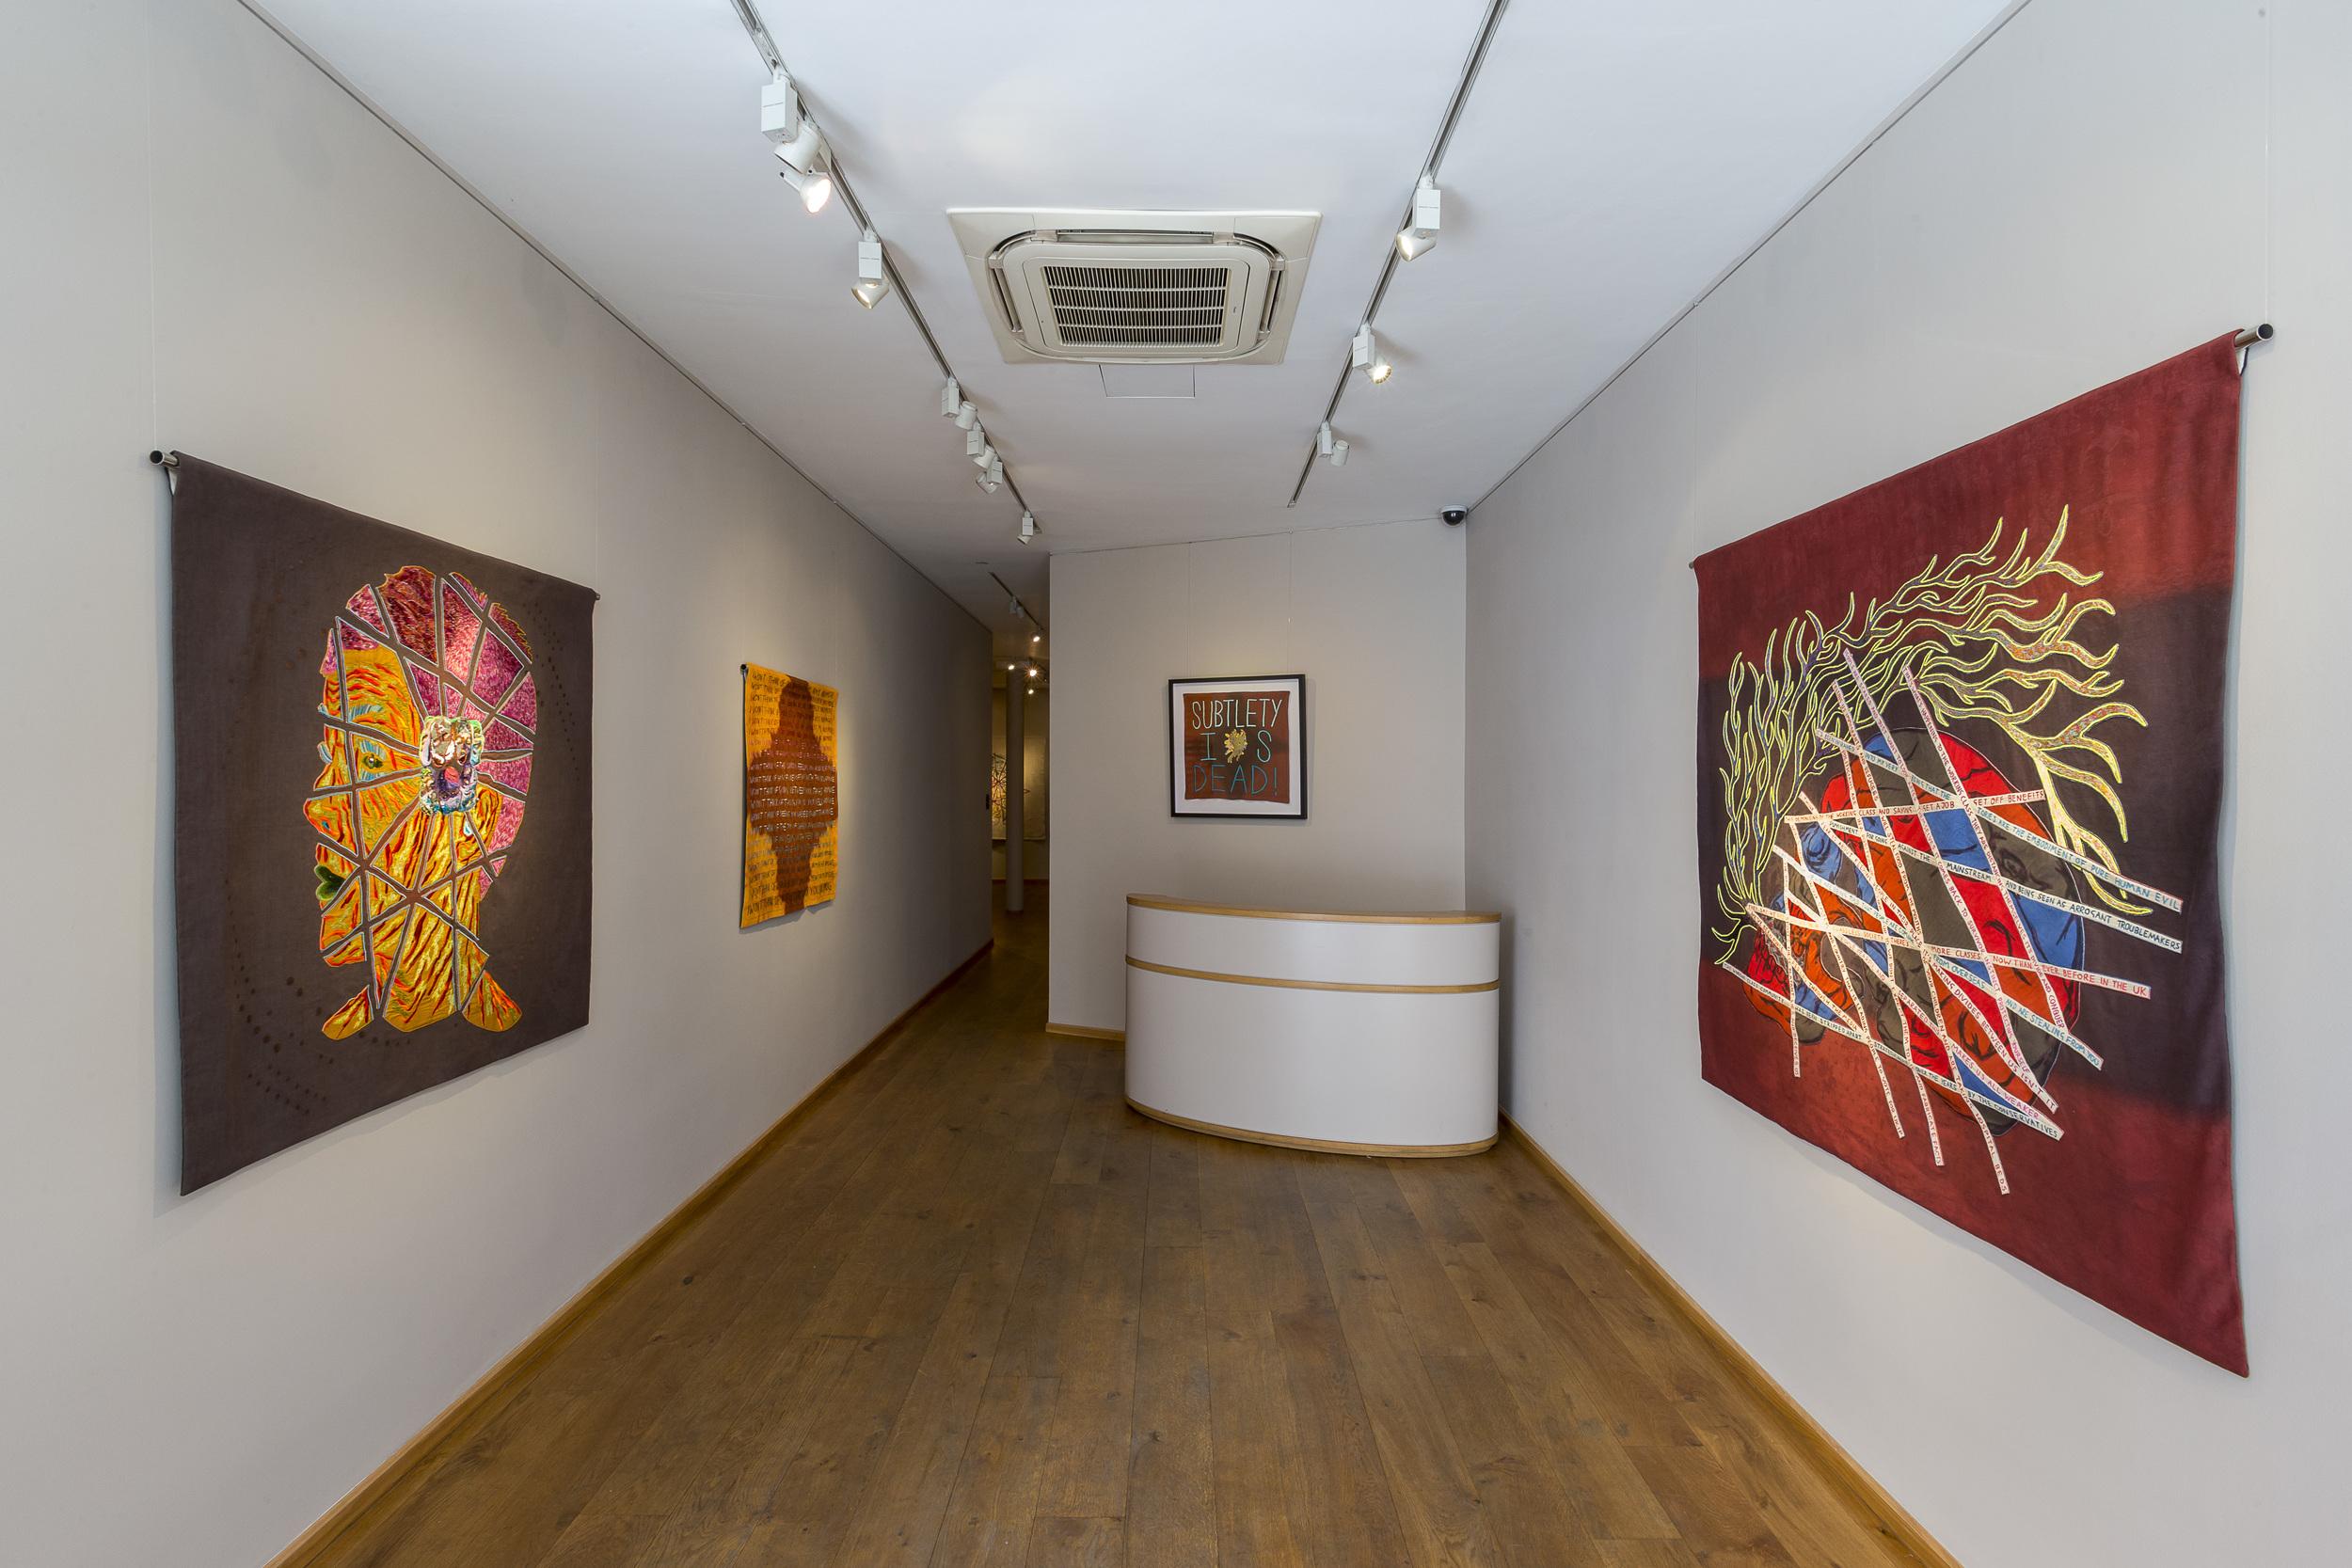 Reliquaries,Coates & Scarry Gallery, 2016